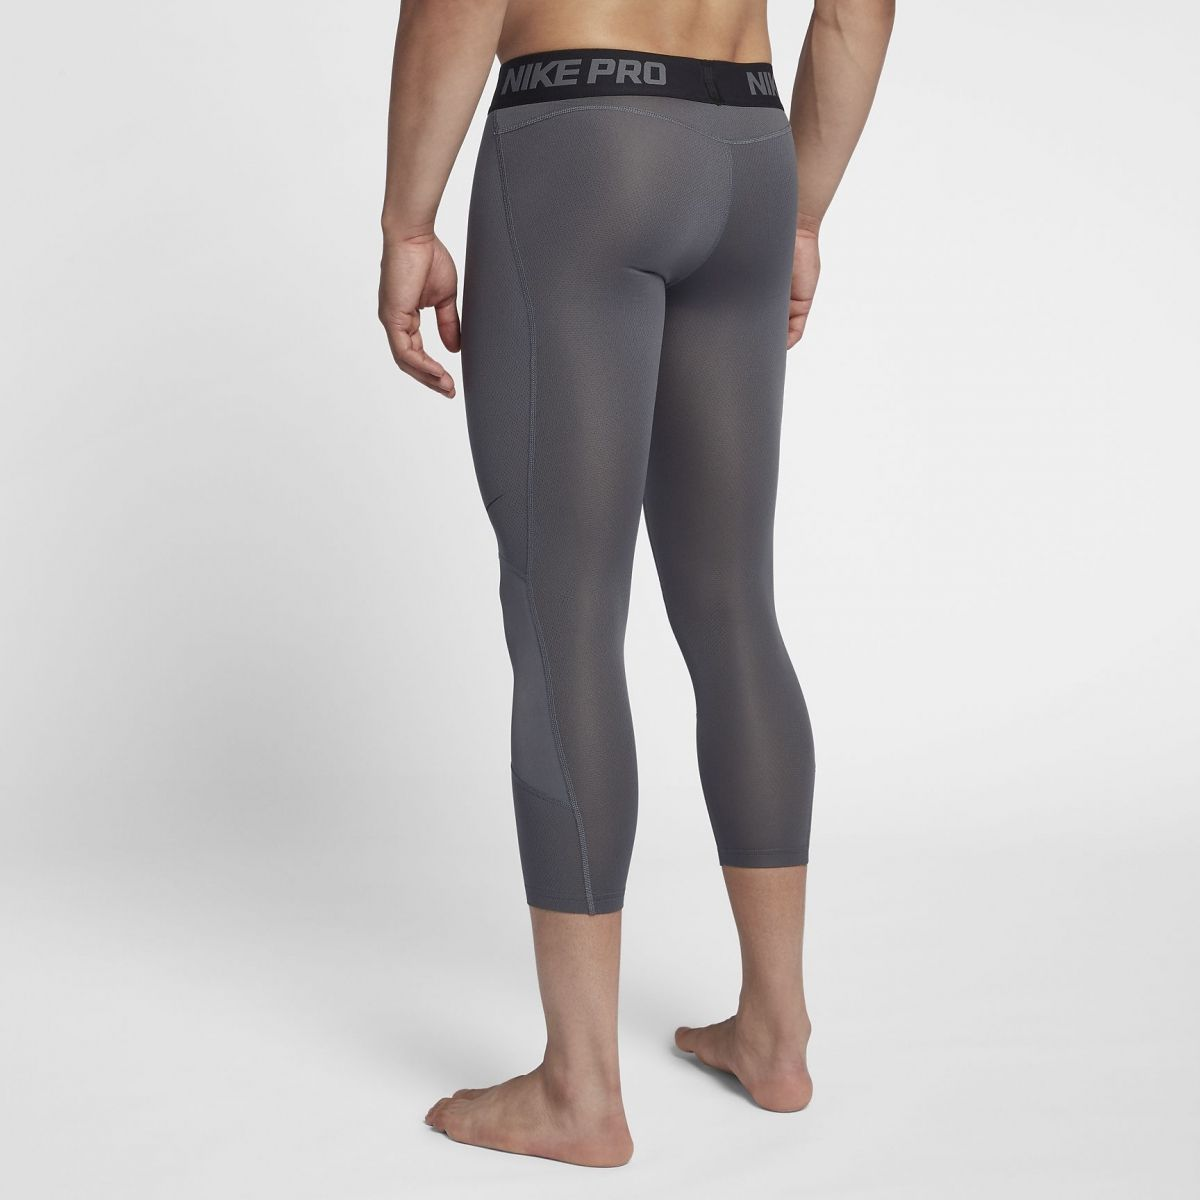 finest selection bfa95 78e7c Type Pants Nike Pro Dri-FIT 3 4 Basketball Tights